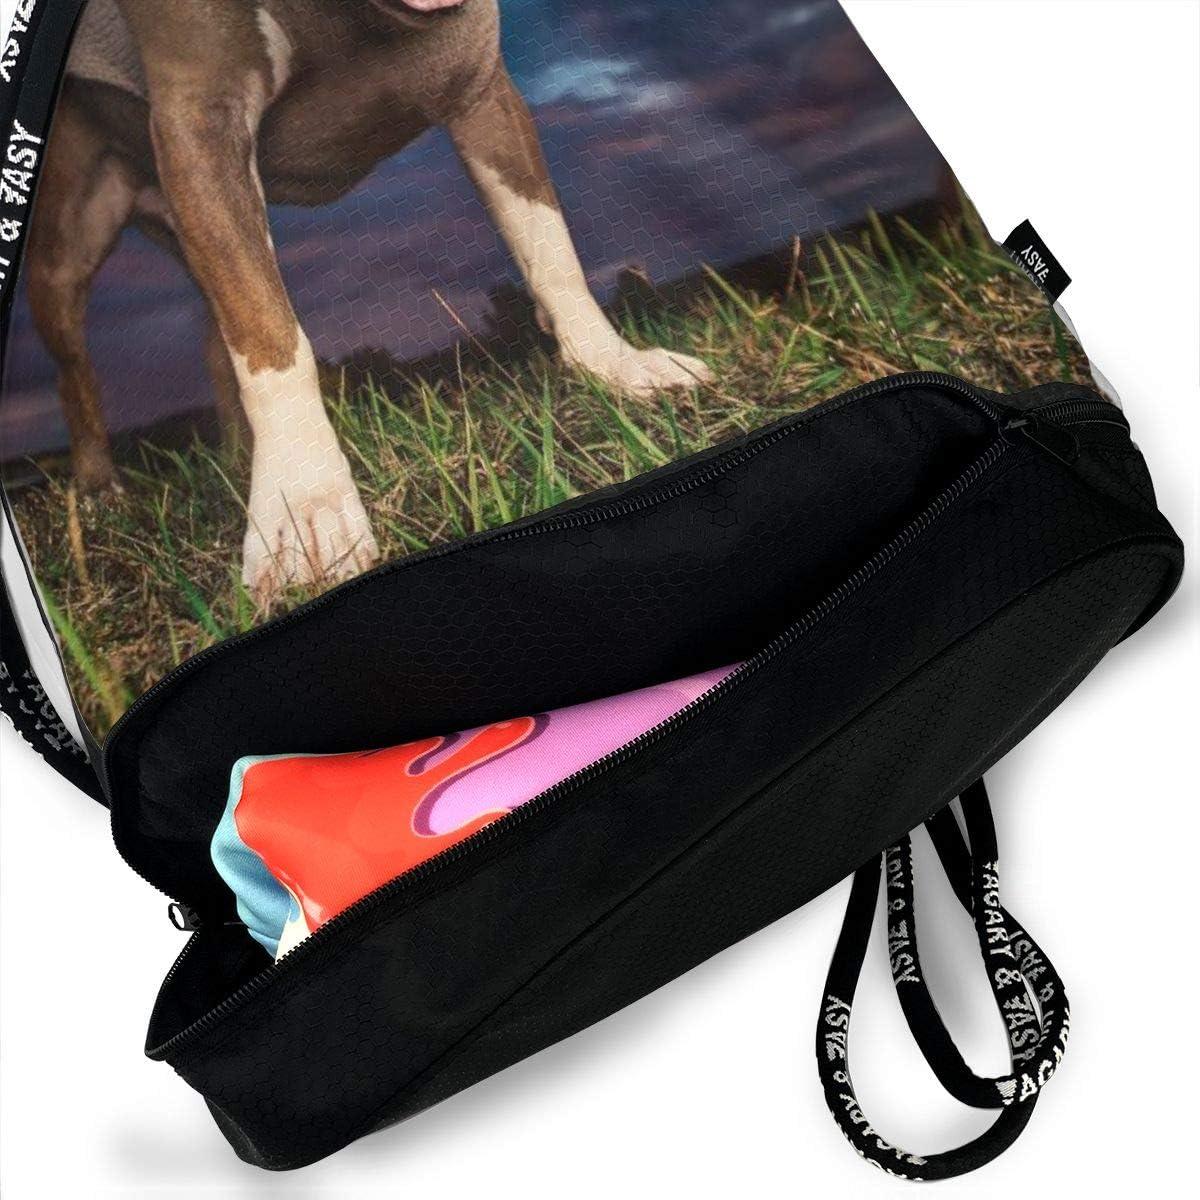 GymSack Drawstring Bag Sackpack Pitbull Wear Sweater Sport Cinch Pack Simple Bundle Pocke Backpack For Men Women